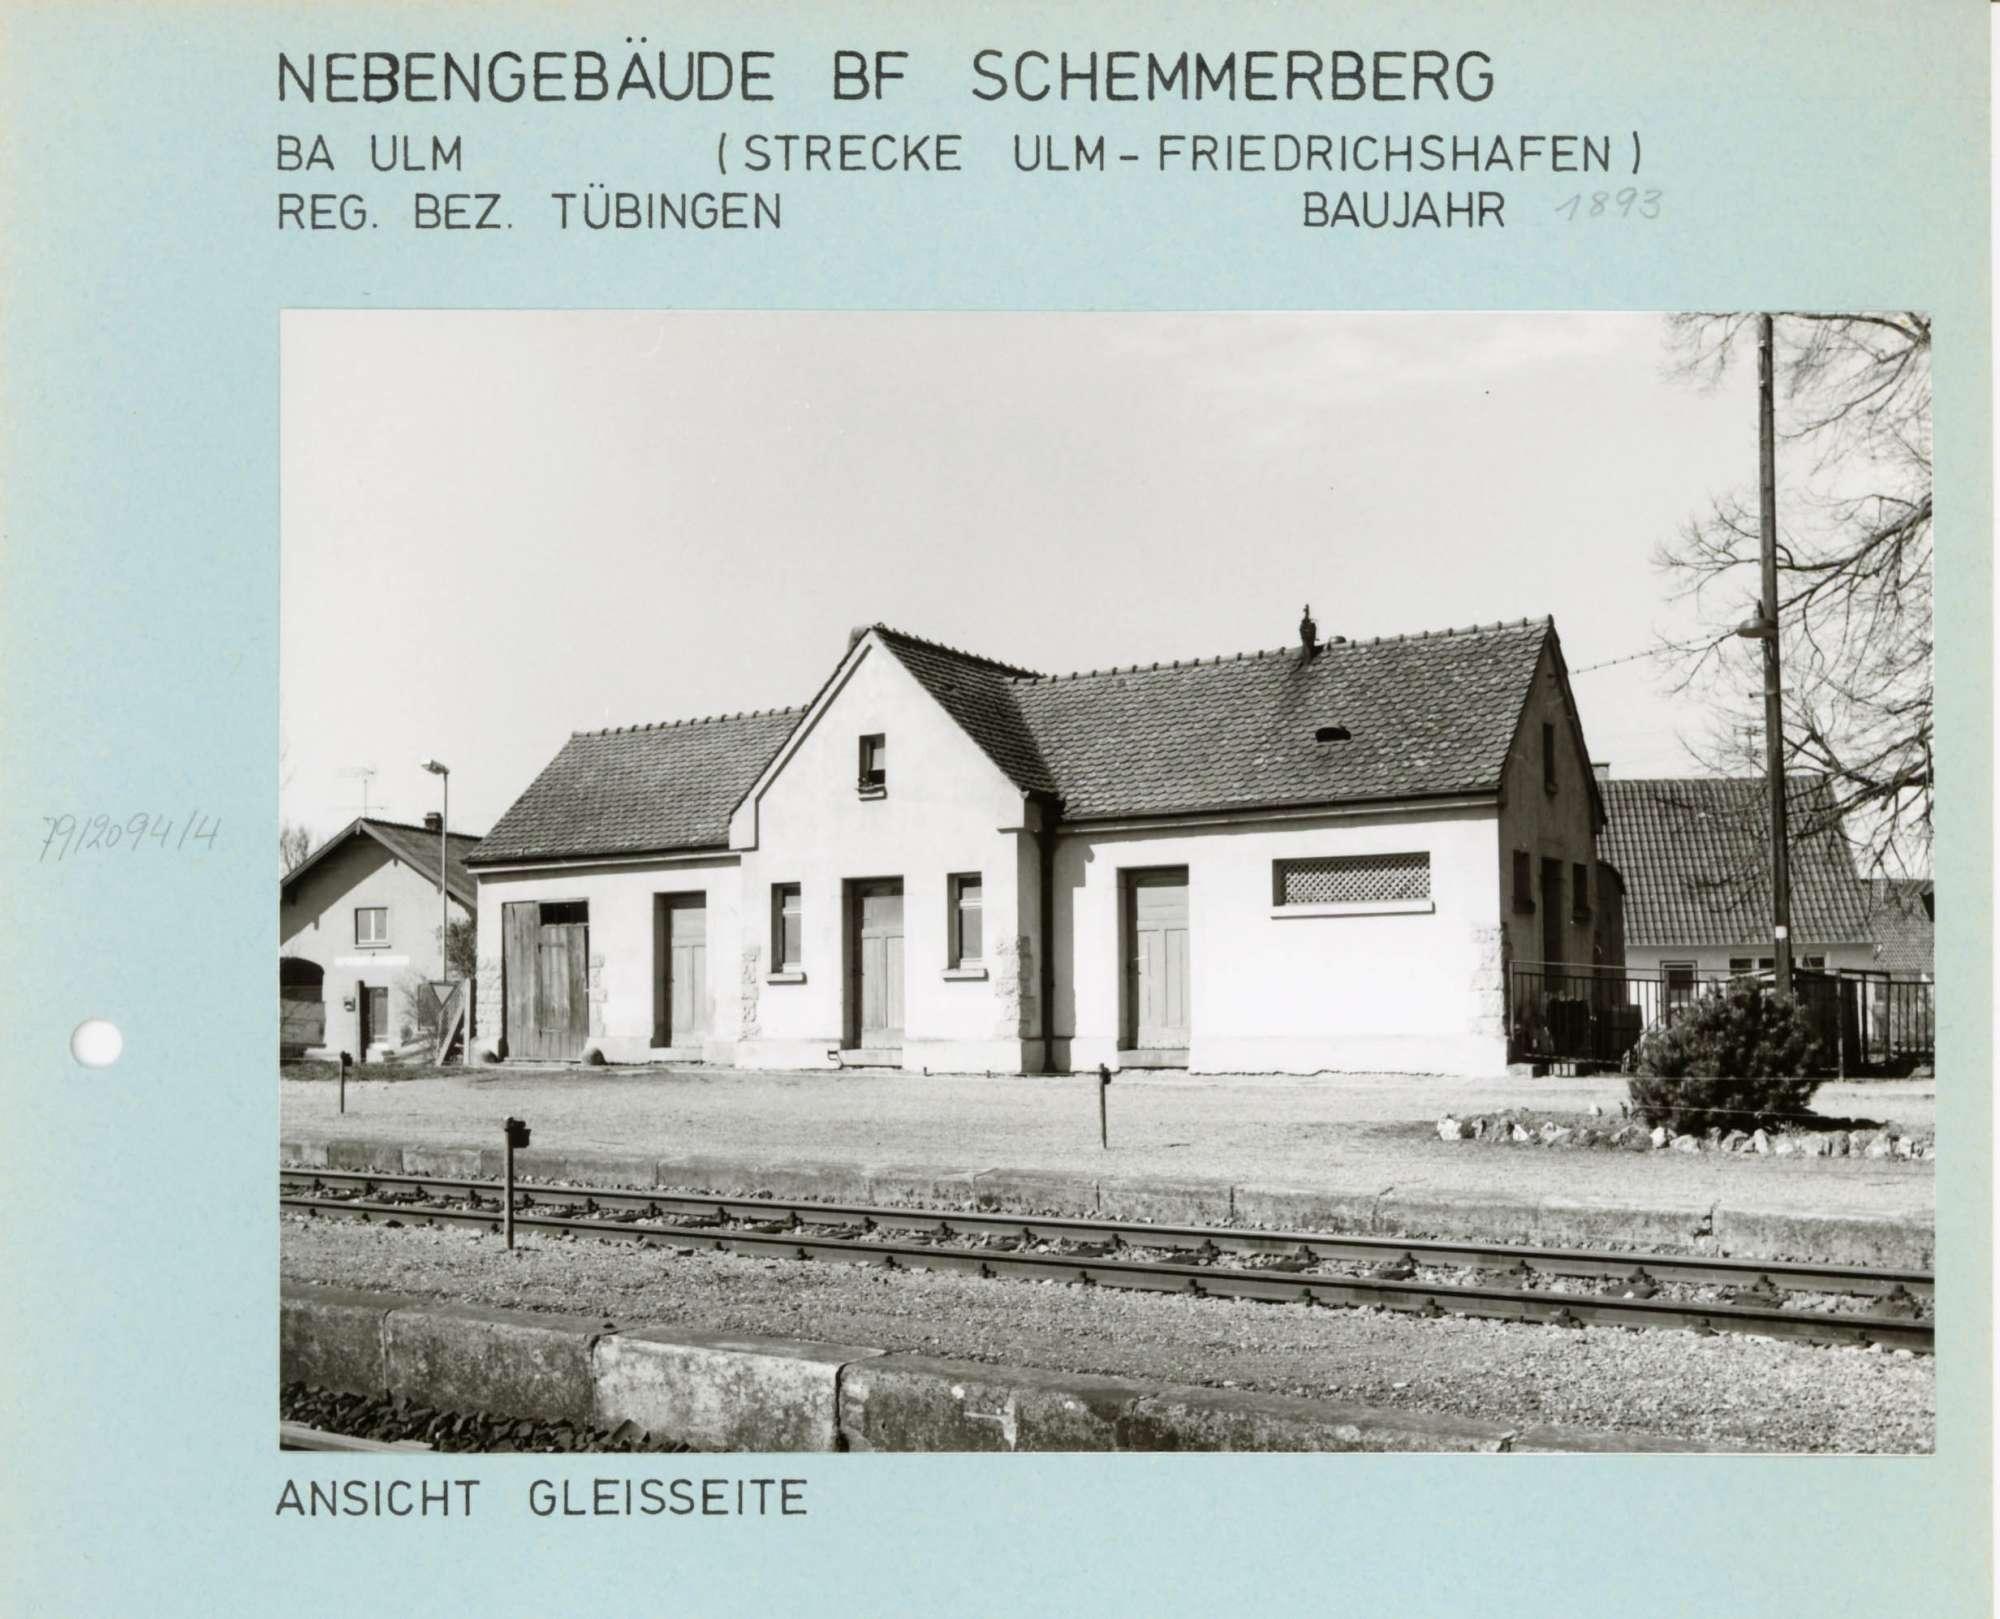 Schemmerberg: 6 Fotos, Bild 2